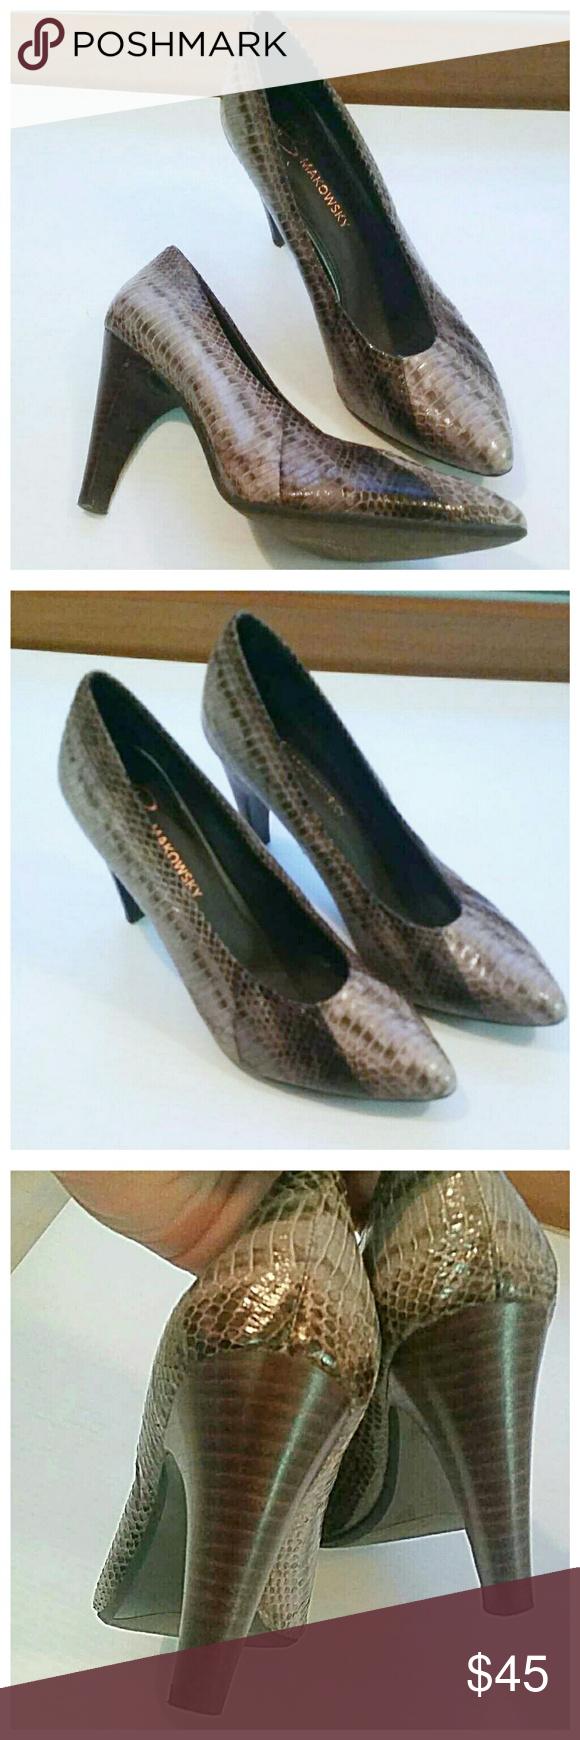 B. Makowsky snakeskin pattern heels In brand new condition. Genuine leather. b. makowsky Shoes Heels